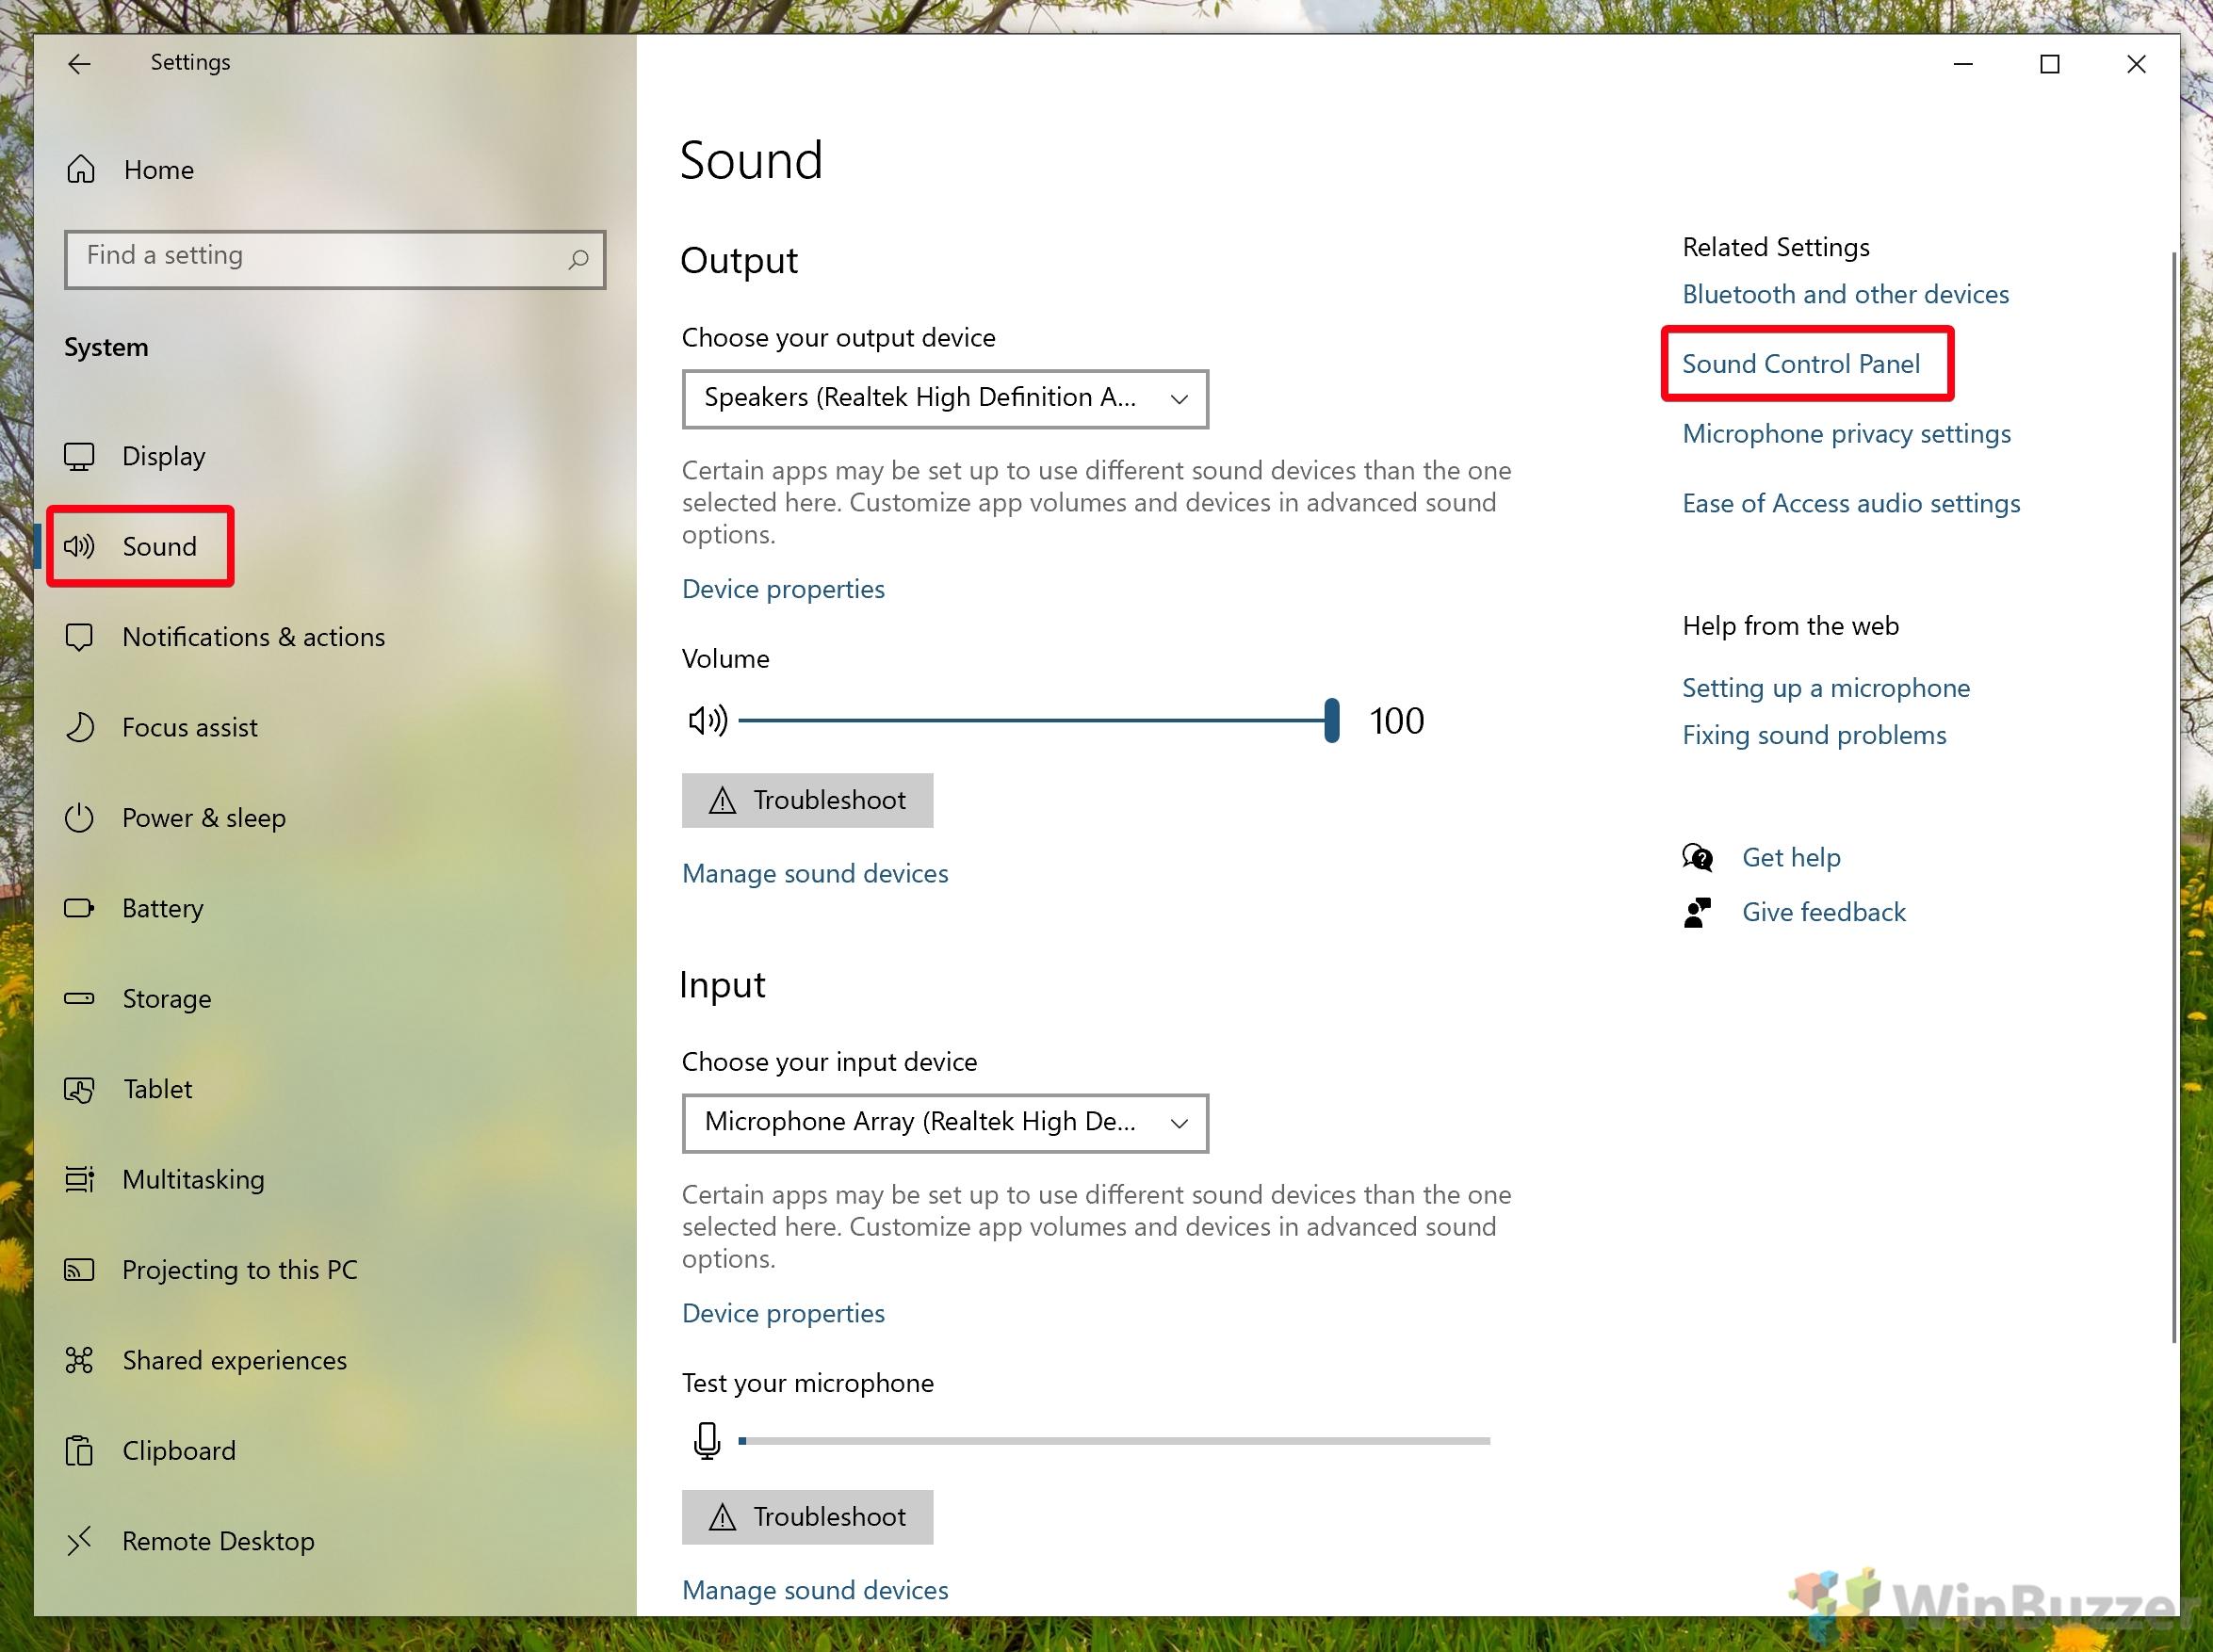 Windows 10 - Settings - Open System